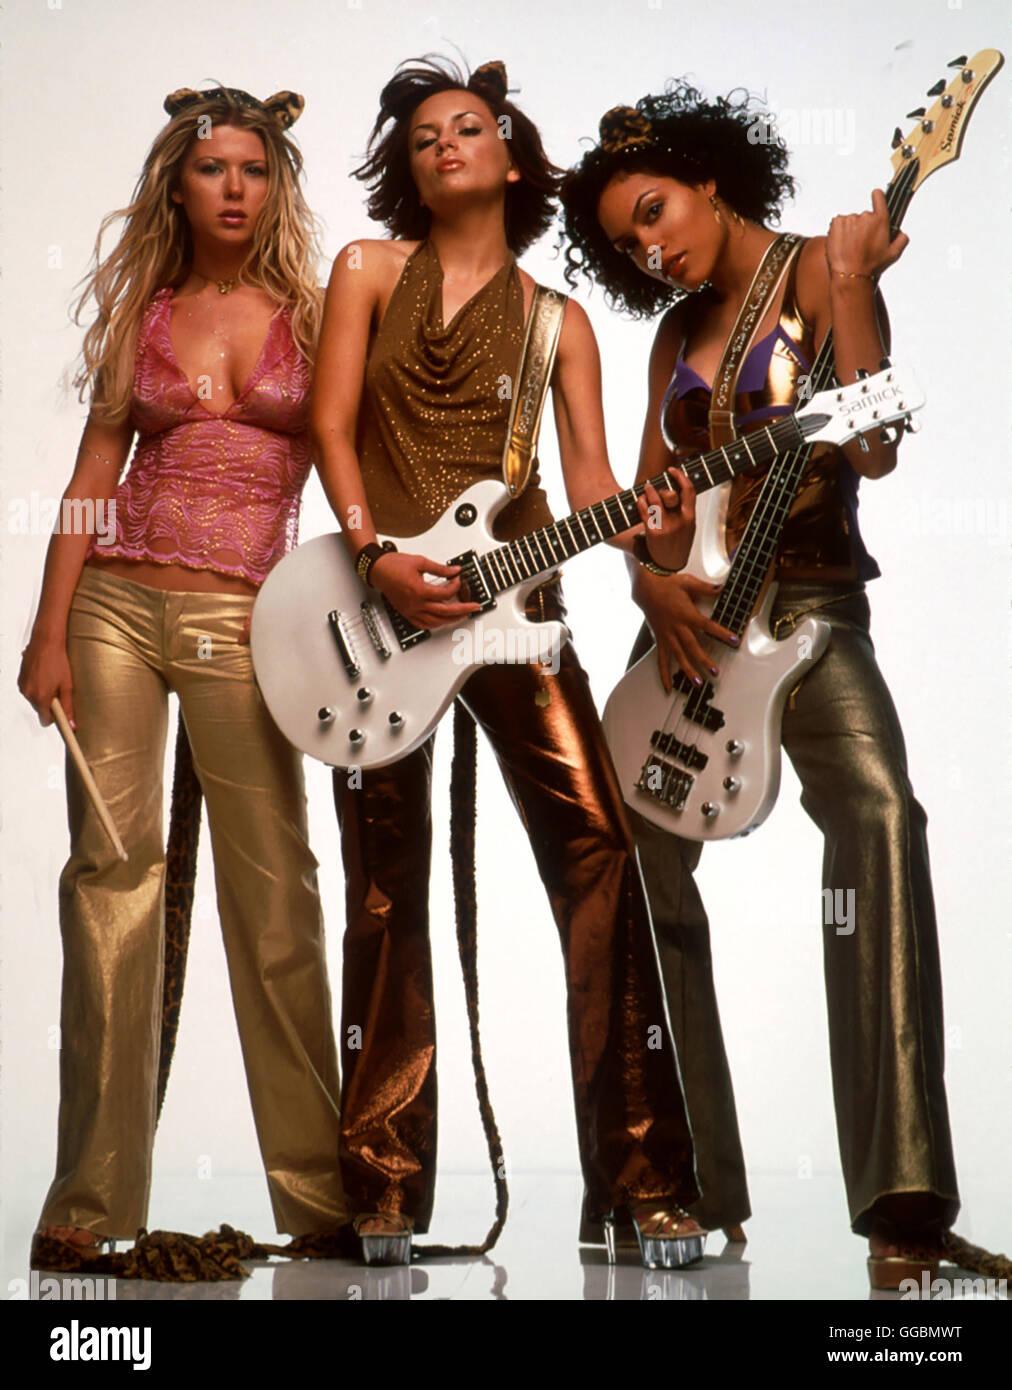 JOSIE PUSSYCATS / Josie Pussycats USA 2000 / Deborah Kaplan/Harry Elfont Die besten Freundinnen Melodie (TARA REID), - Stock Image